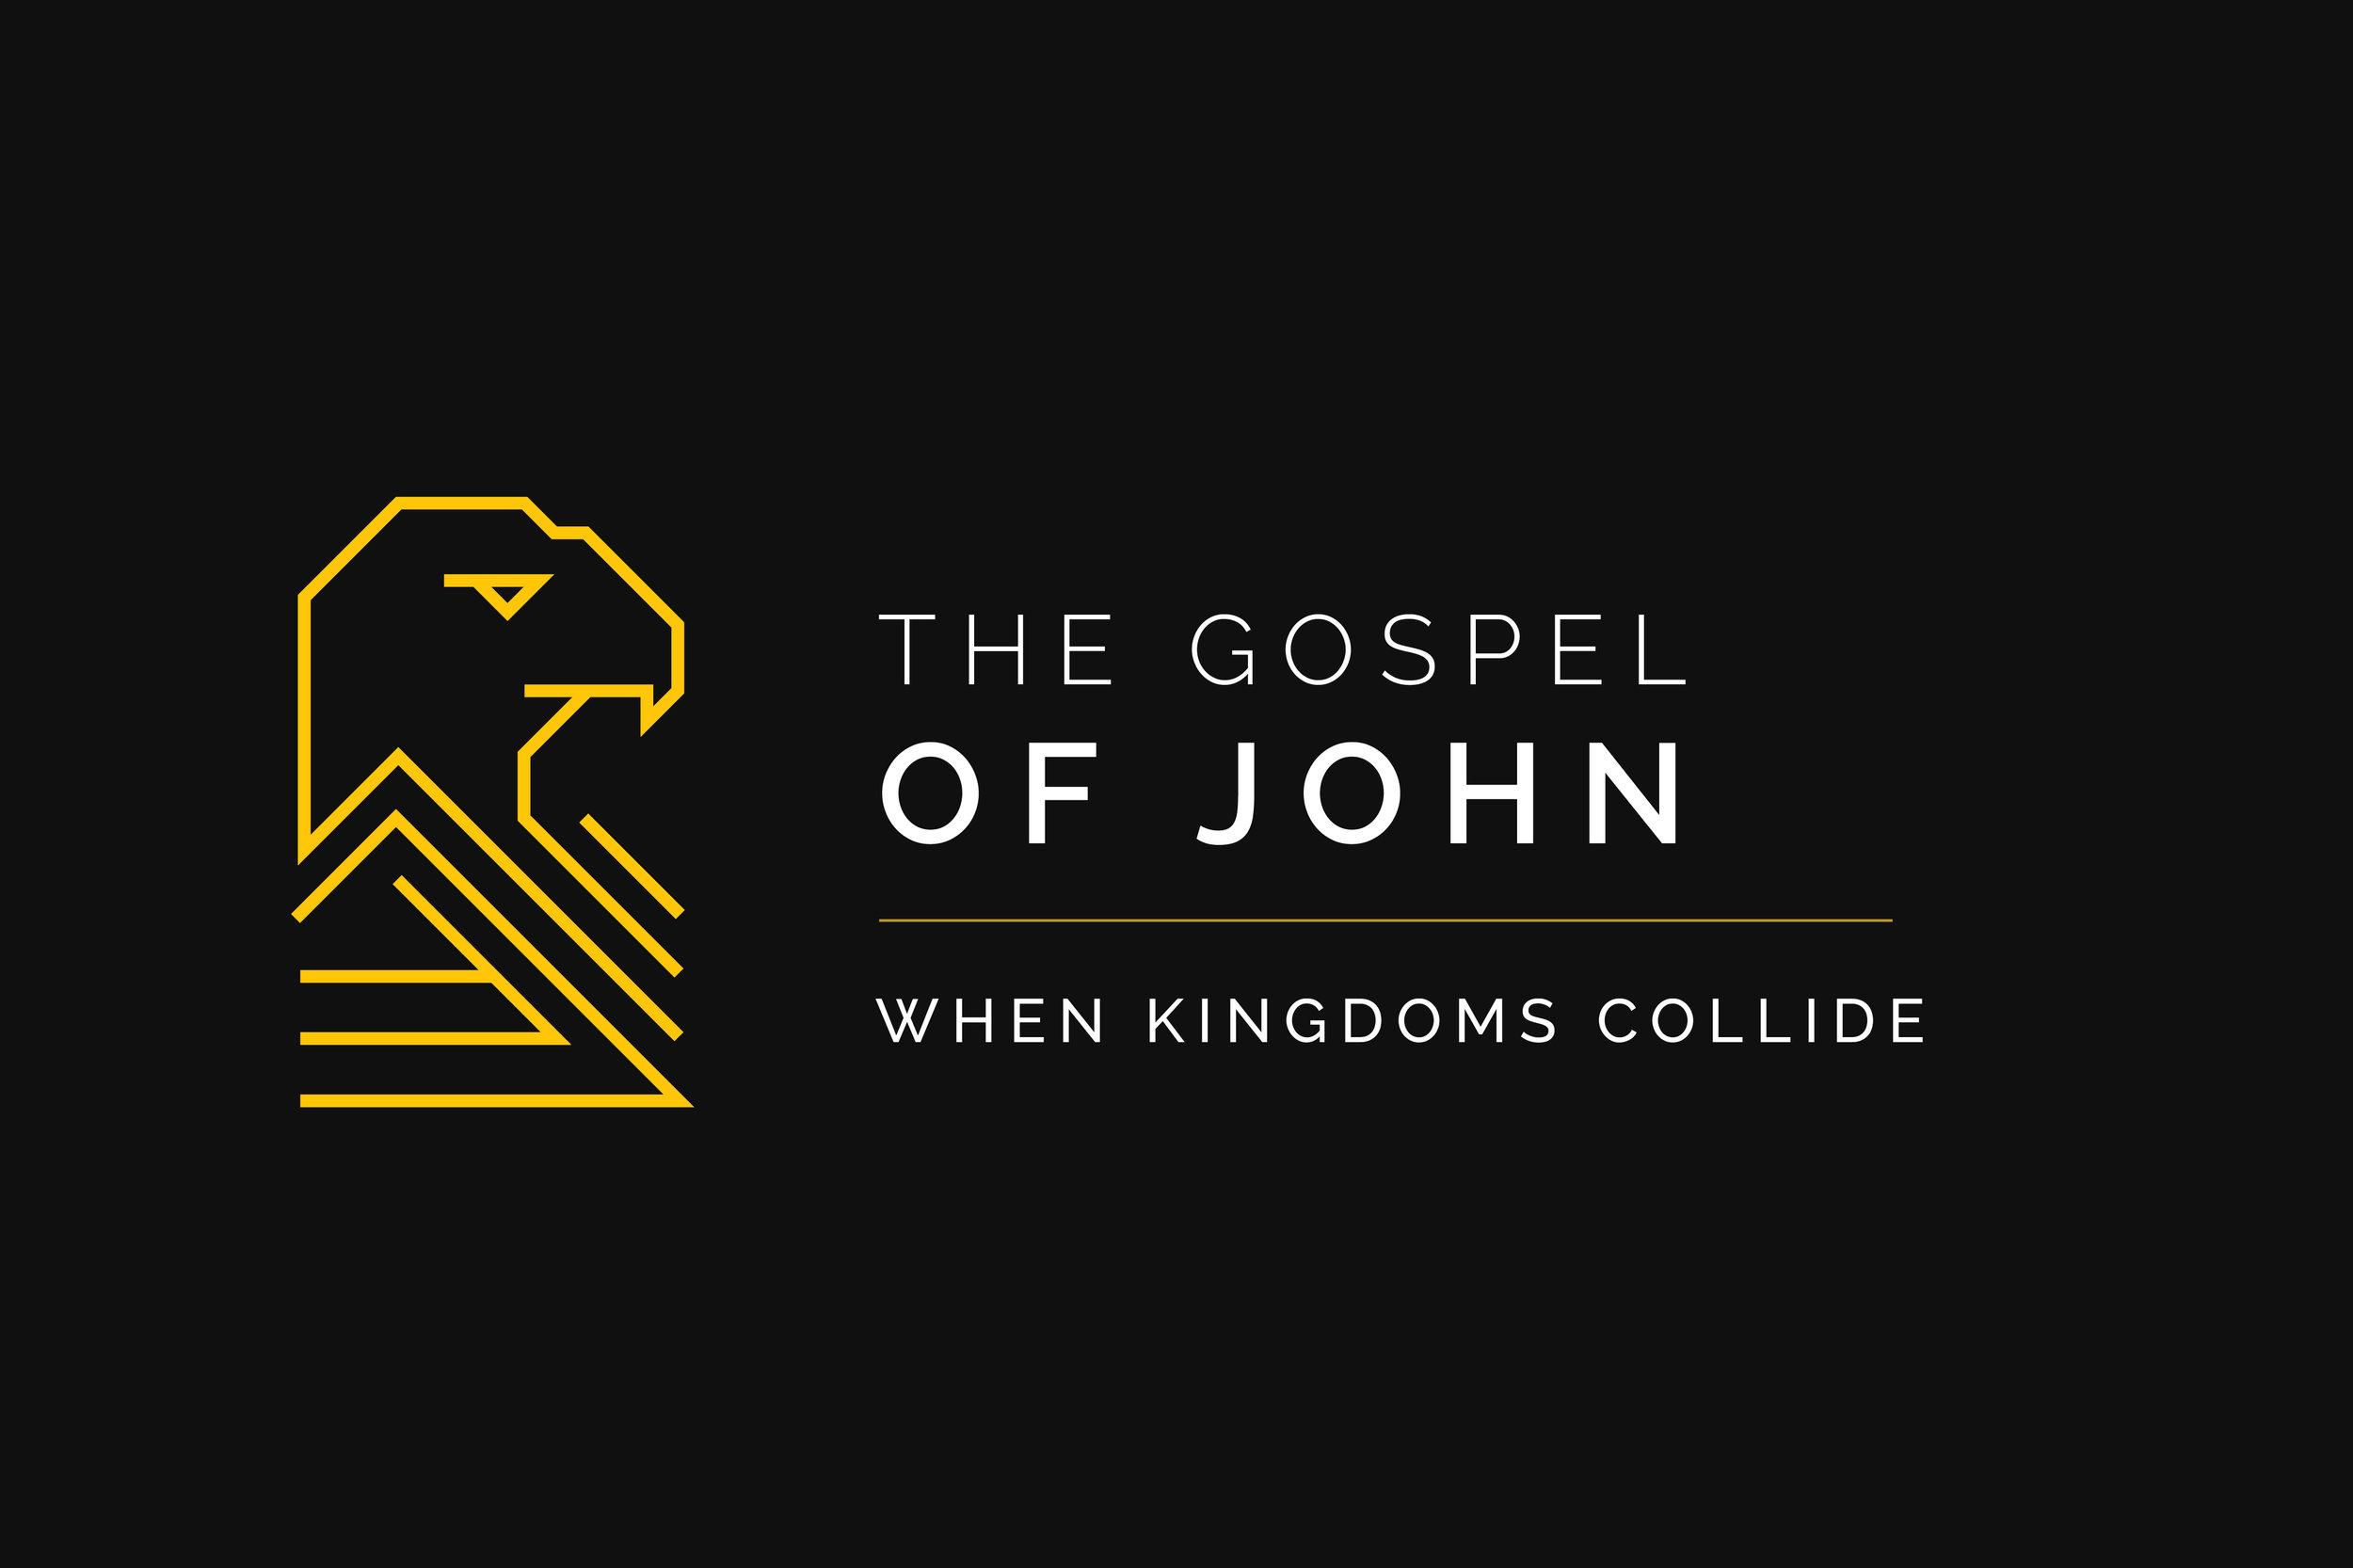 The-Gospel-of-John-when-kingdoms-collide.jpg